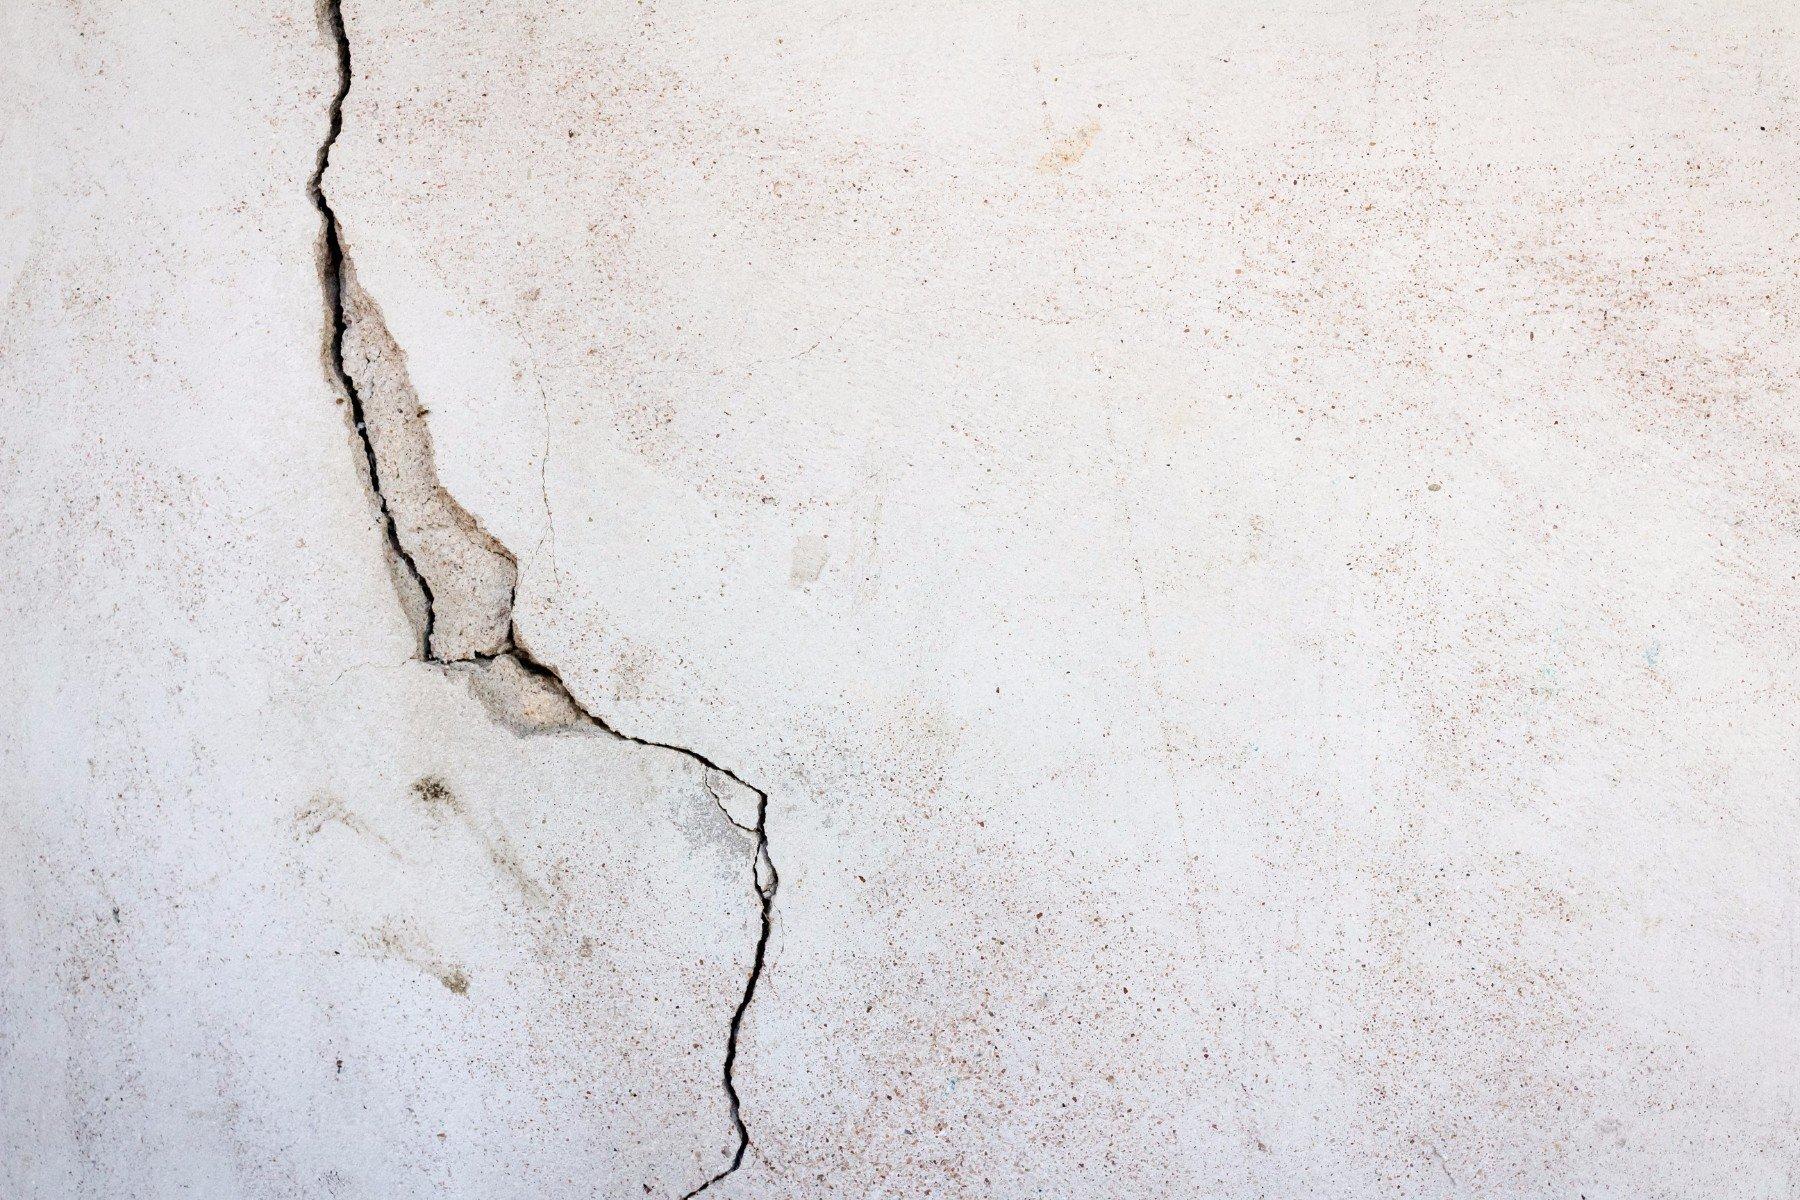 una crepa in un muro